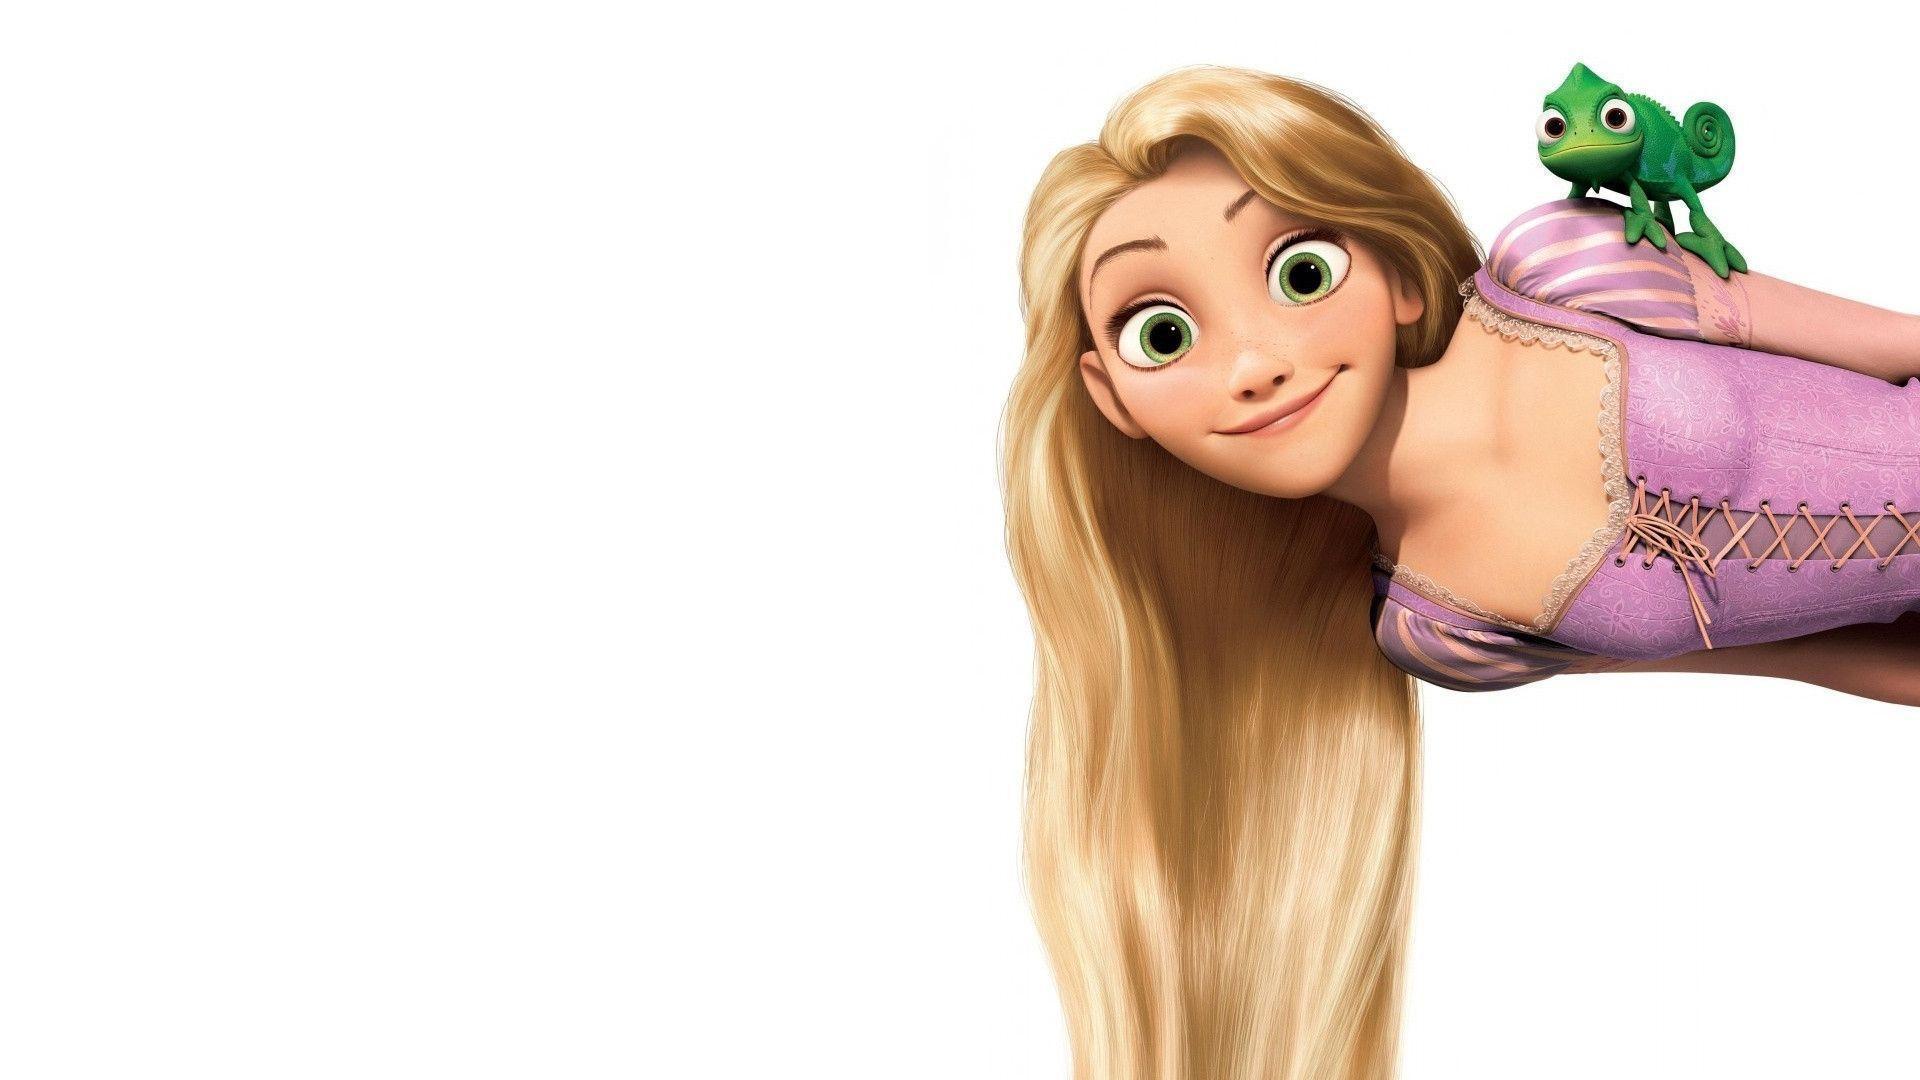 Wallpaper iphone rapunzel - Pix For Rapunzel Wallpaper For Iphone